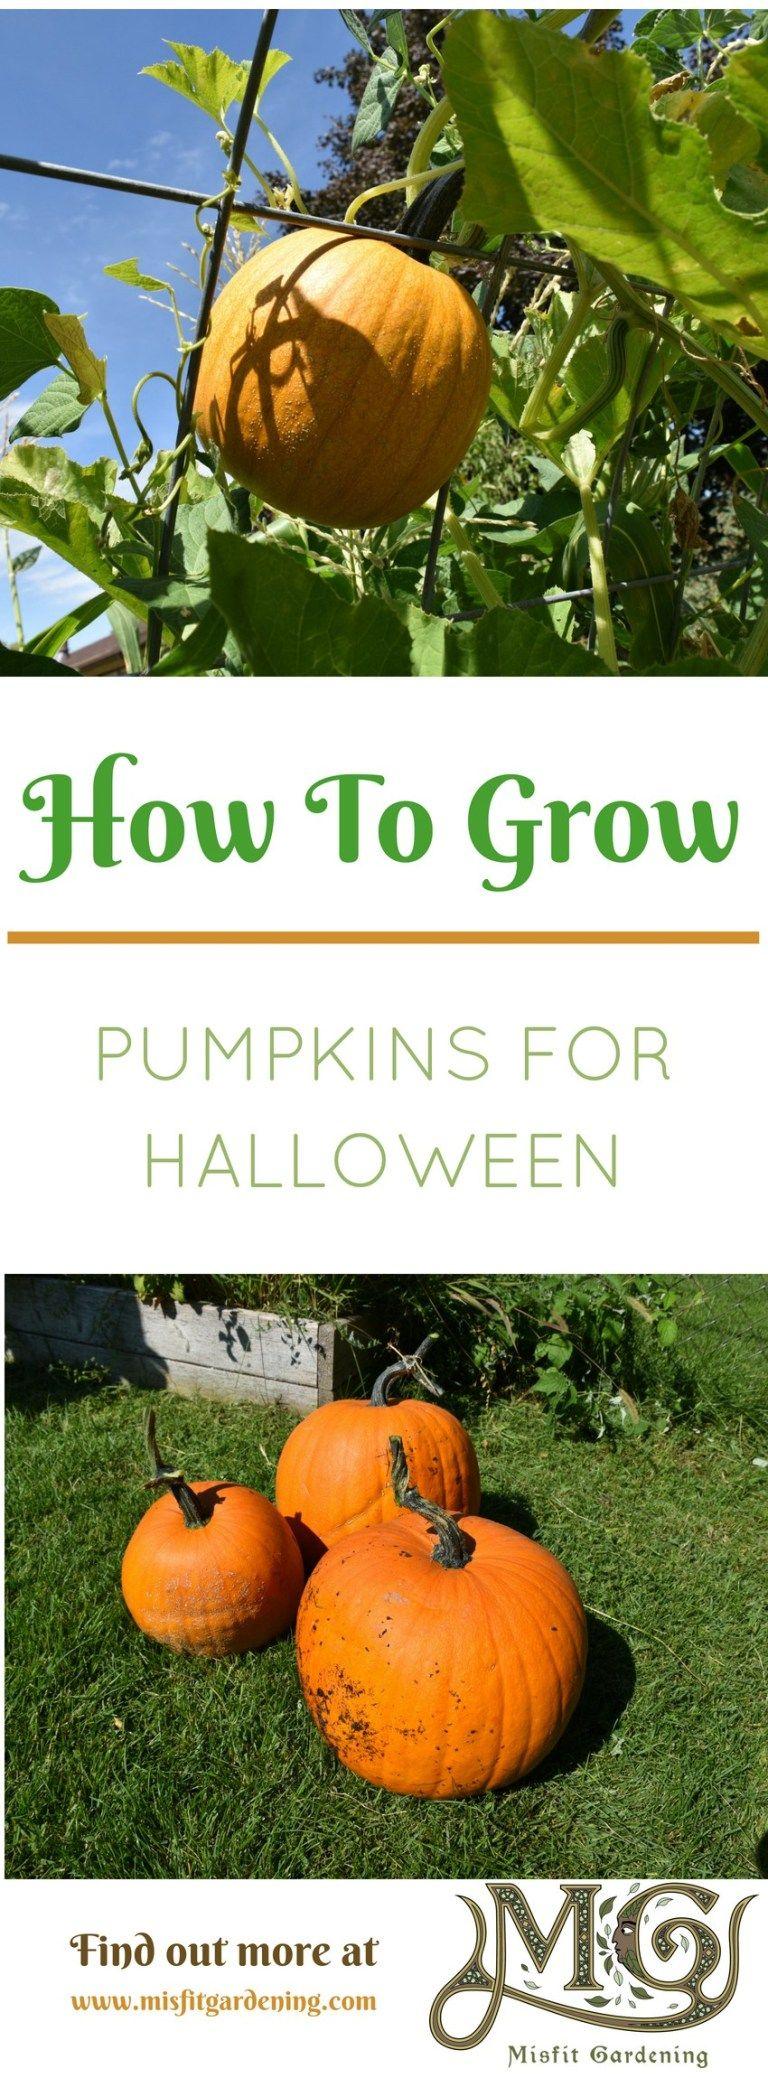 How To Grow Pumpkins For Halloween - Misfit Gardening